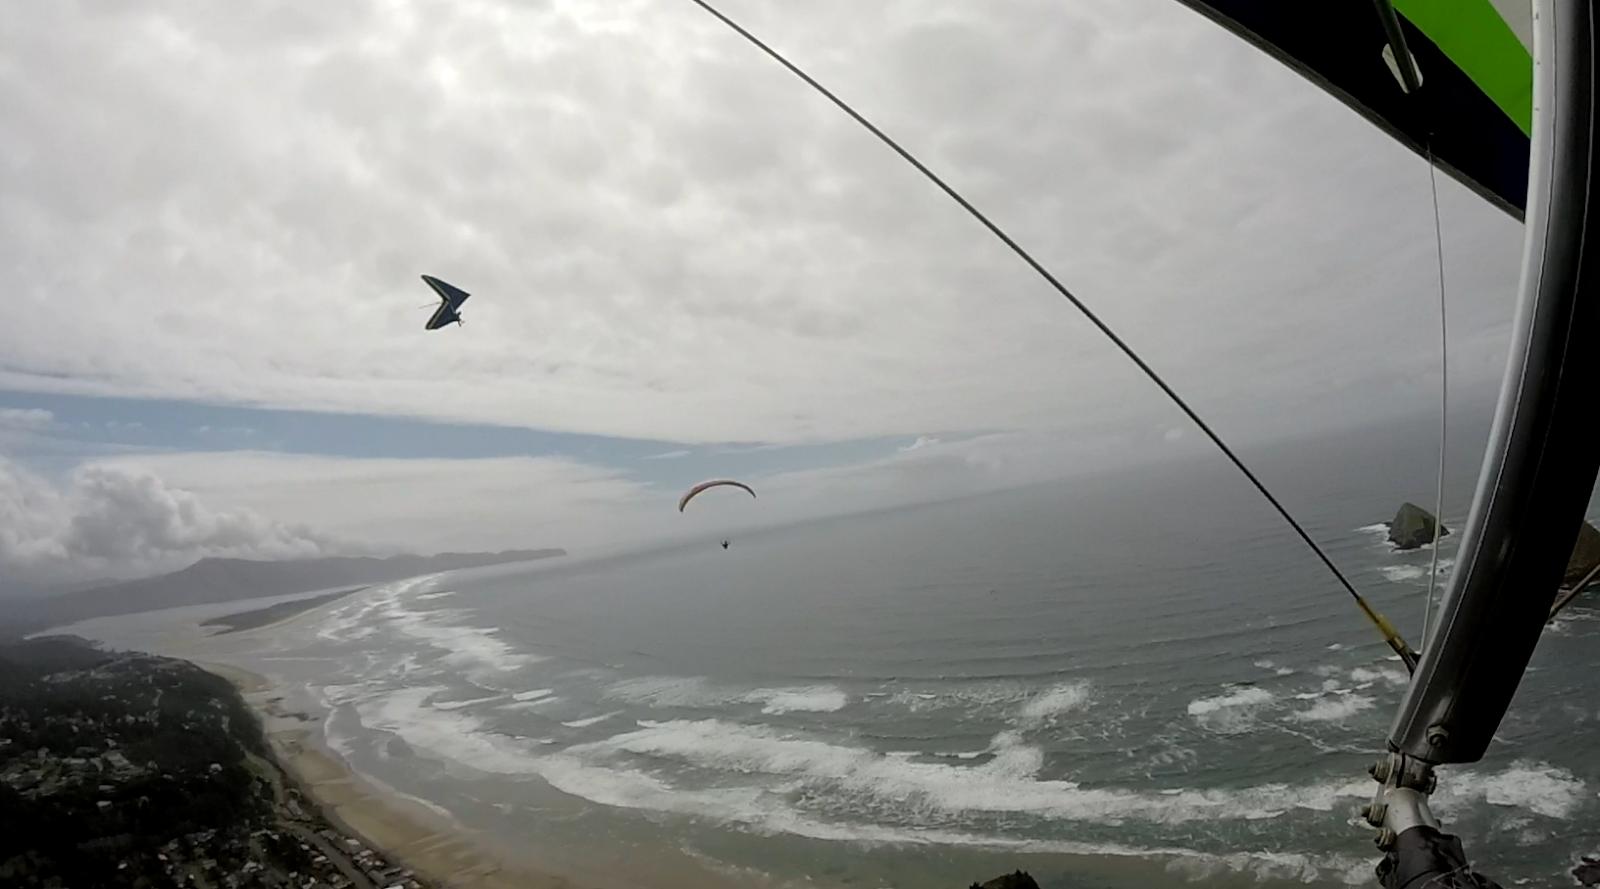 Rick Lai's Hang Gliding report : 4 hrs flights at Oceanside